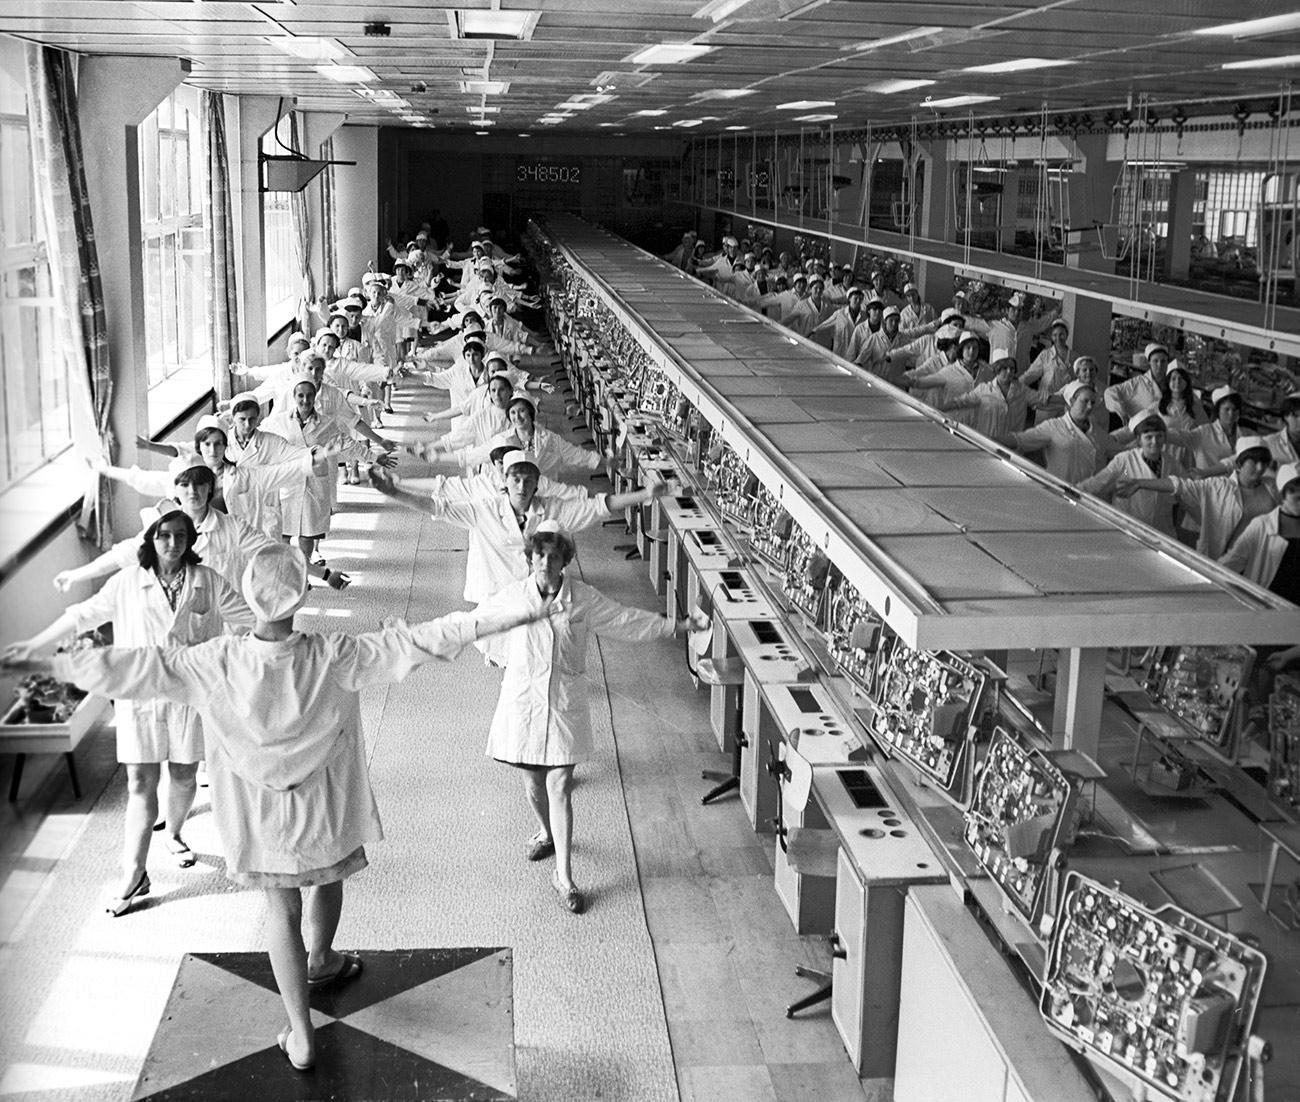 Industrial gymnastics at Lvov Television Manufacturing. 01.06.1969